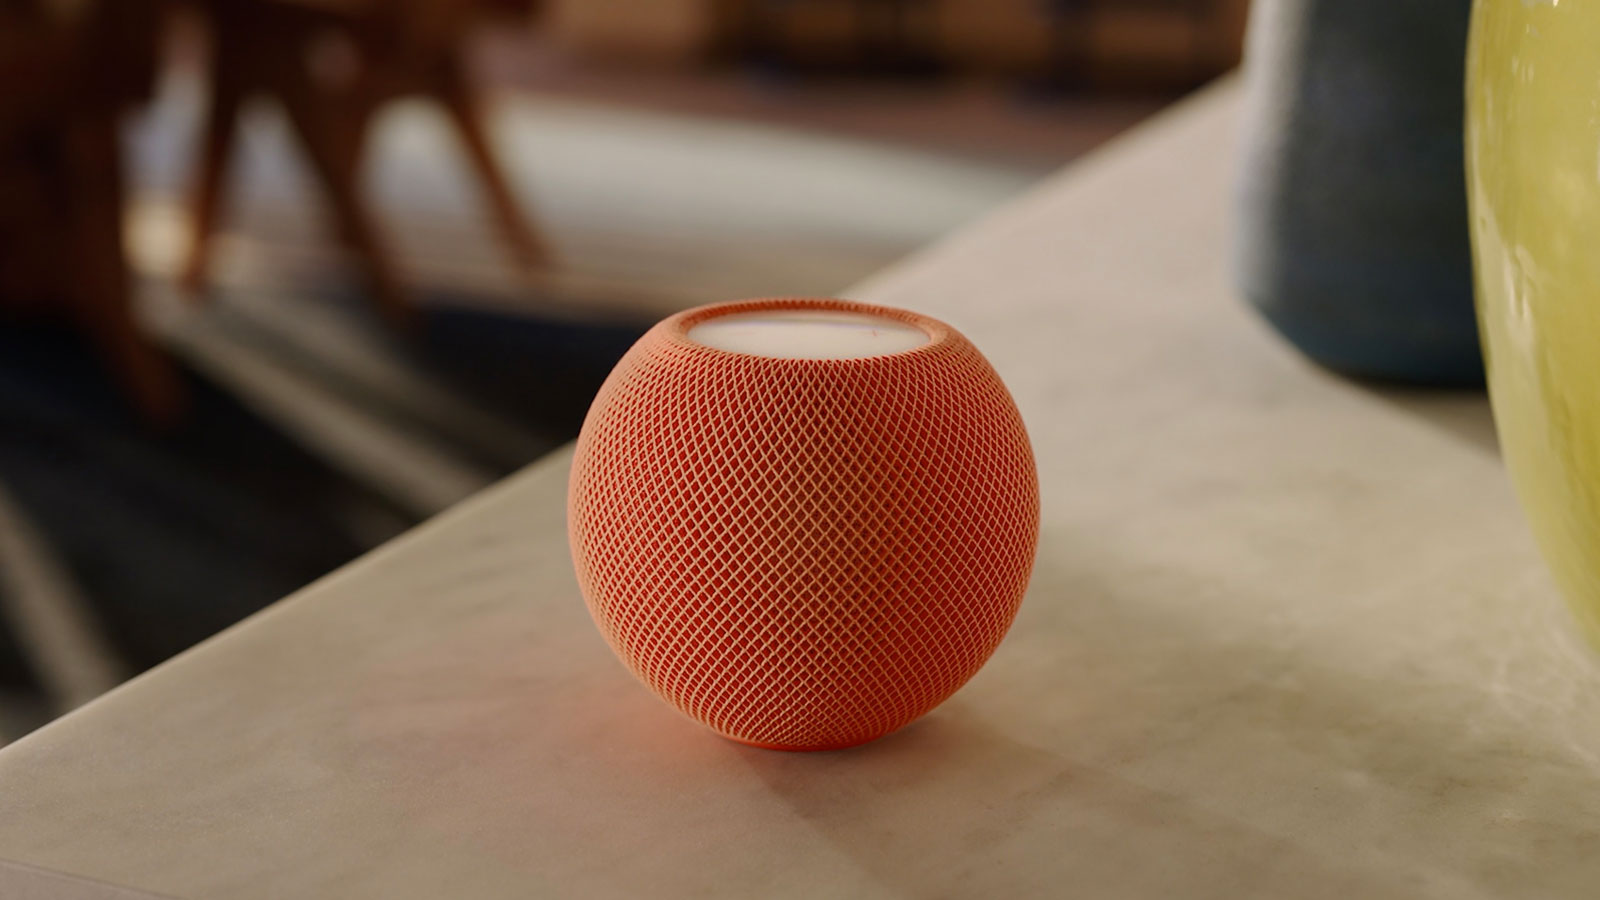 Apple's HomePod mini gets new colors   TechCrunch